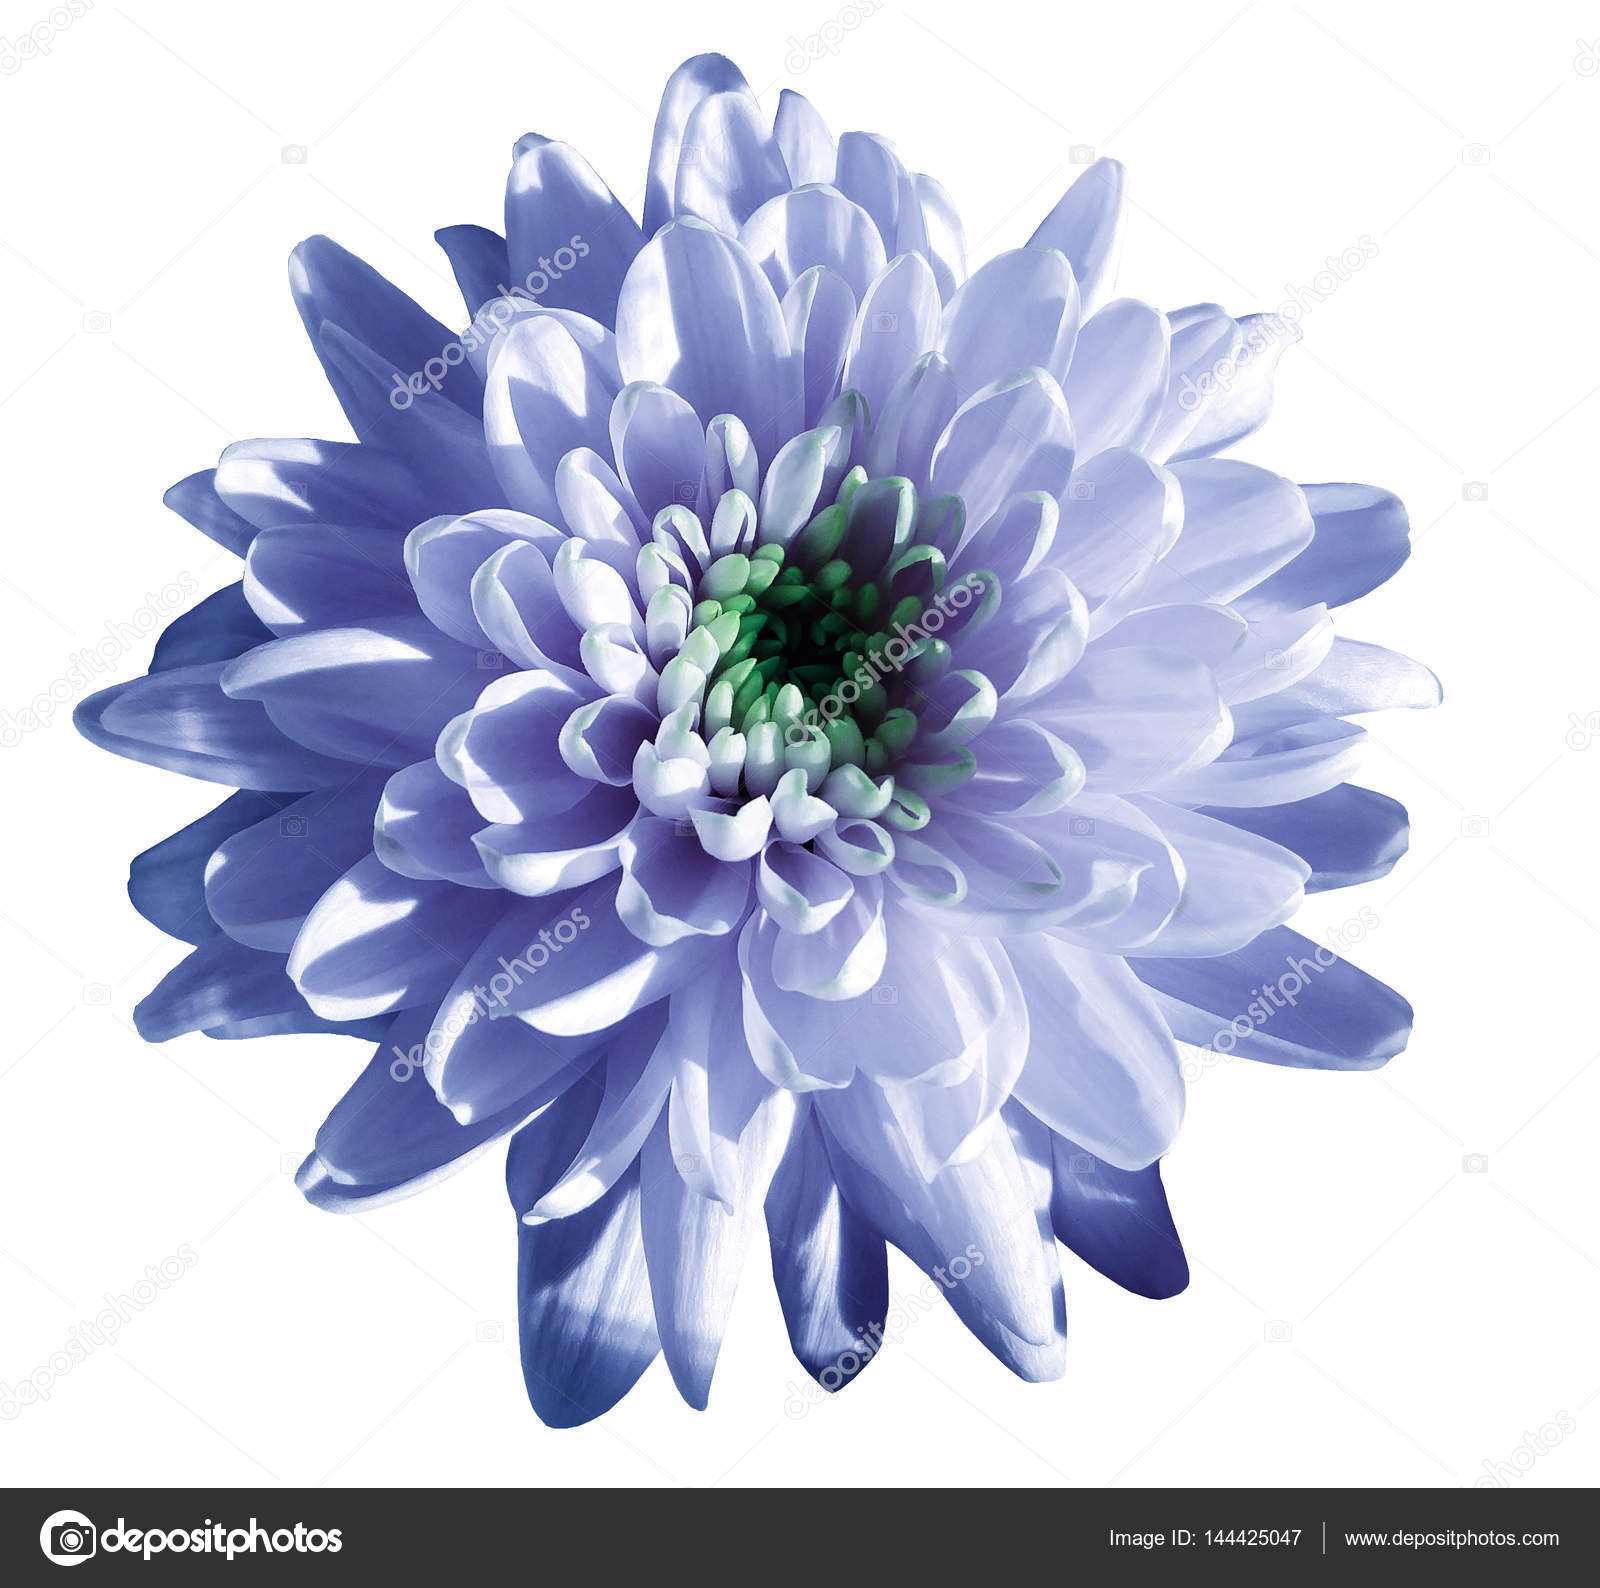 Blue white flower chrysanthemum garden flower white isolated blue white flower chrysanthemum garden flower white isolated background with clipping path closeup no shadows green centre nature izmirmasajfo